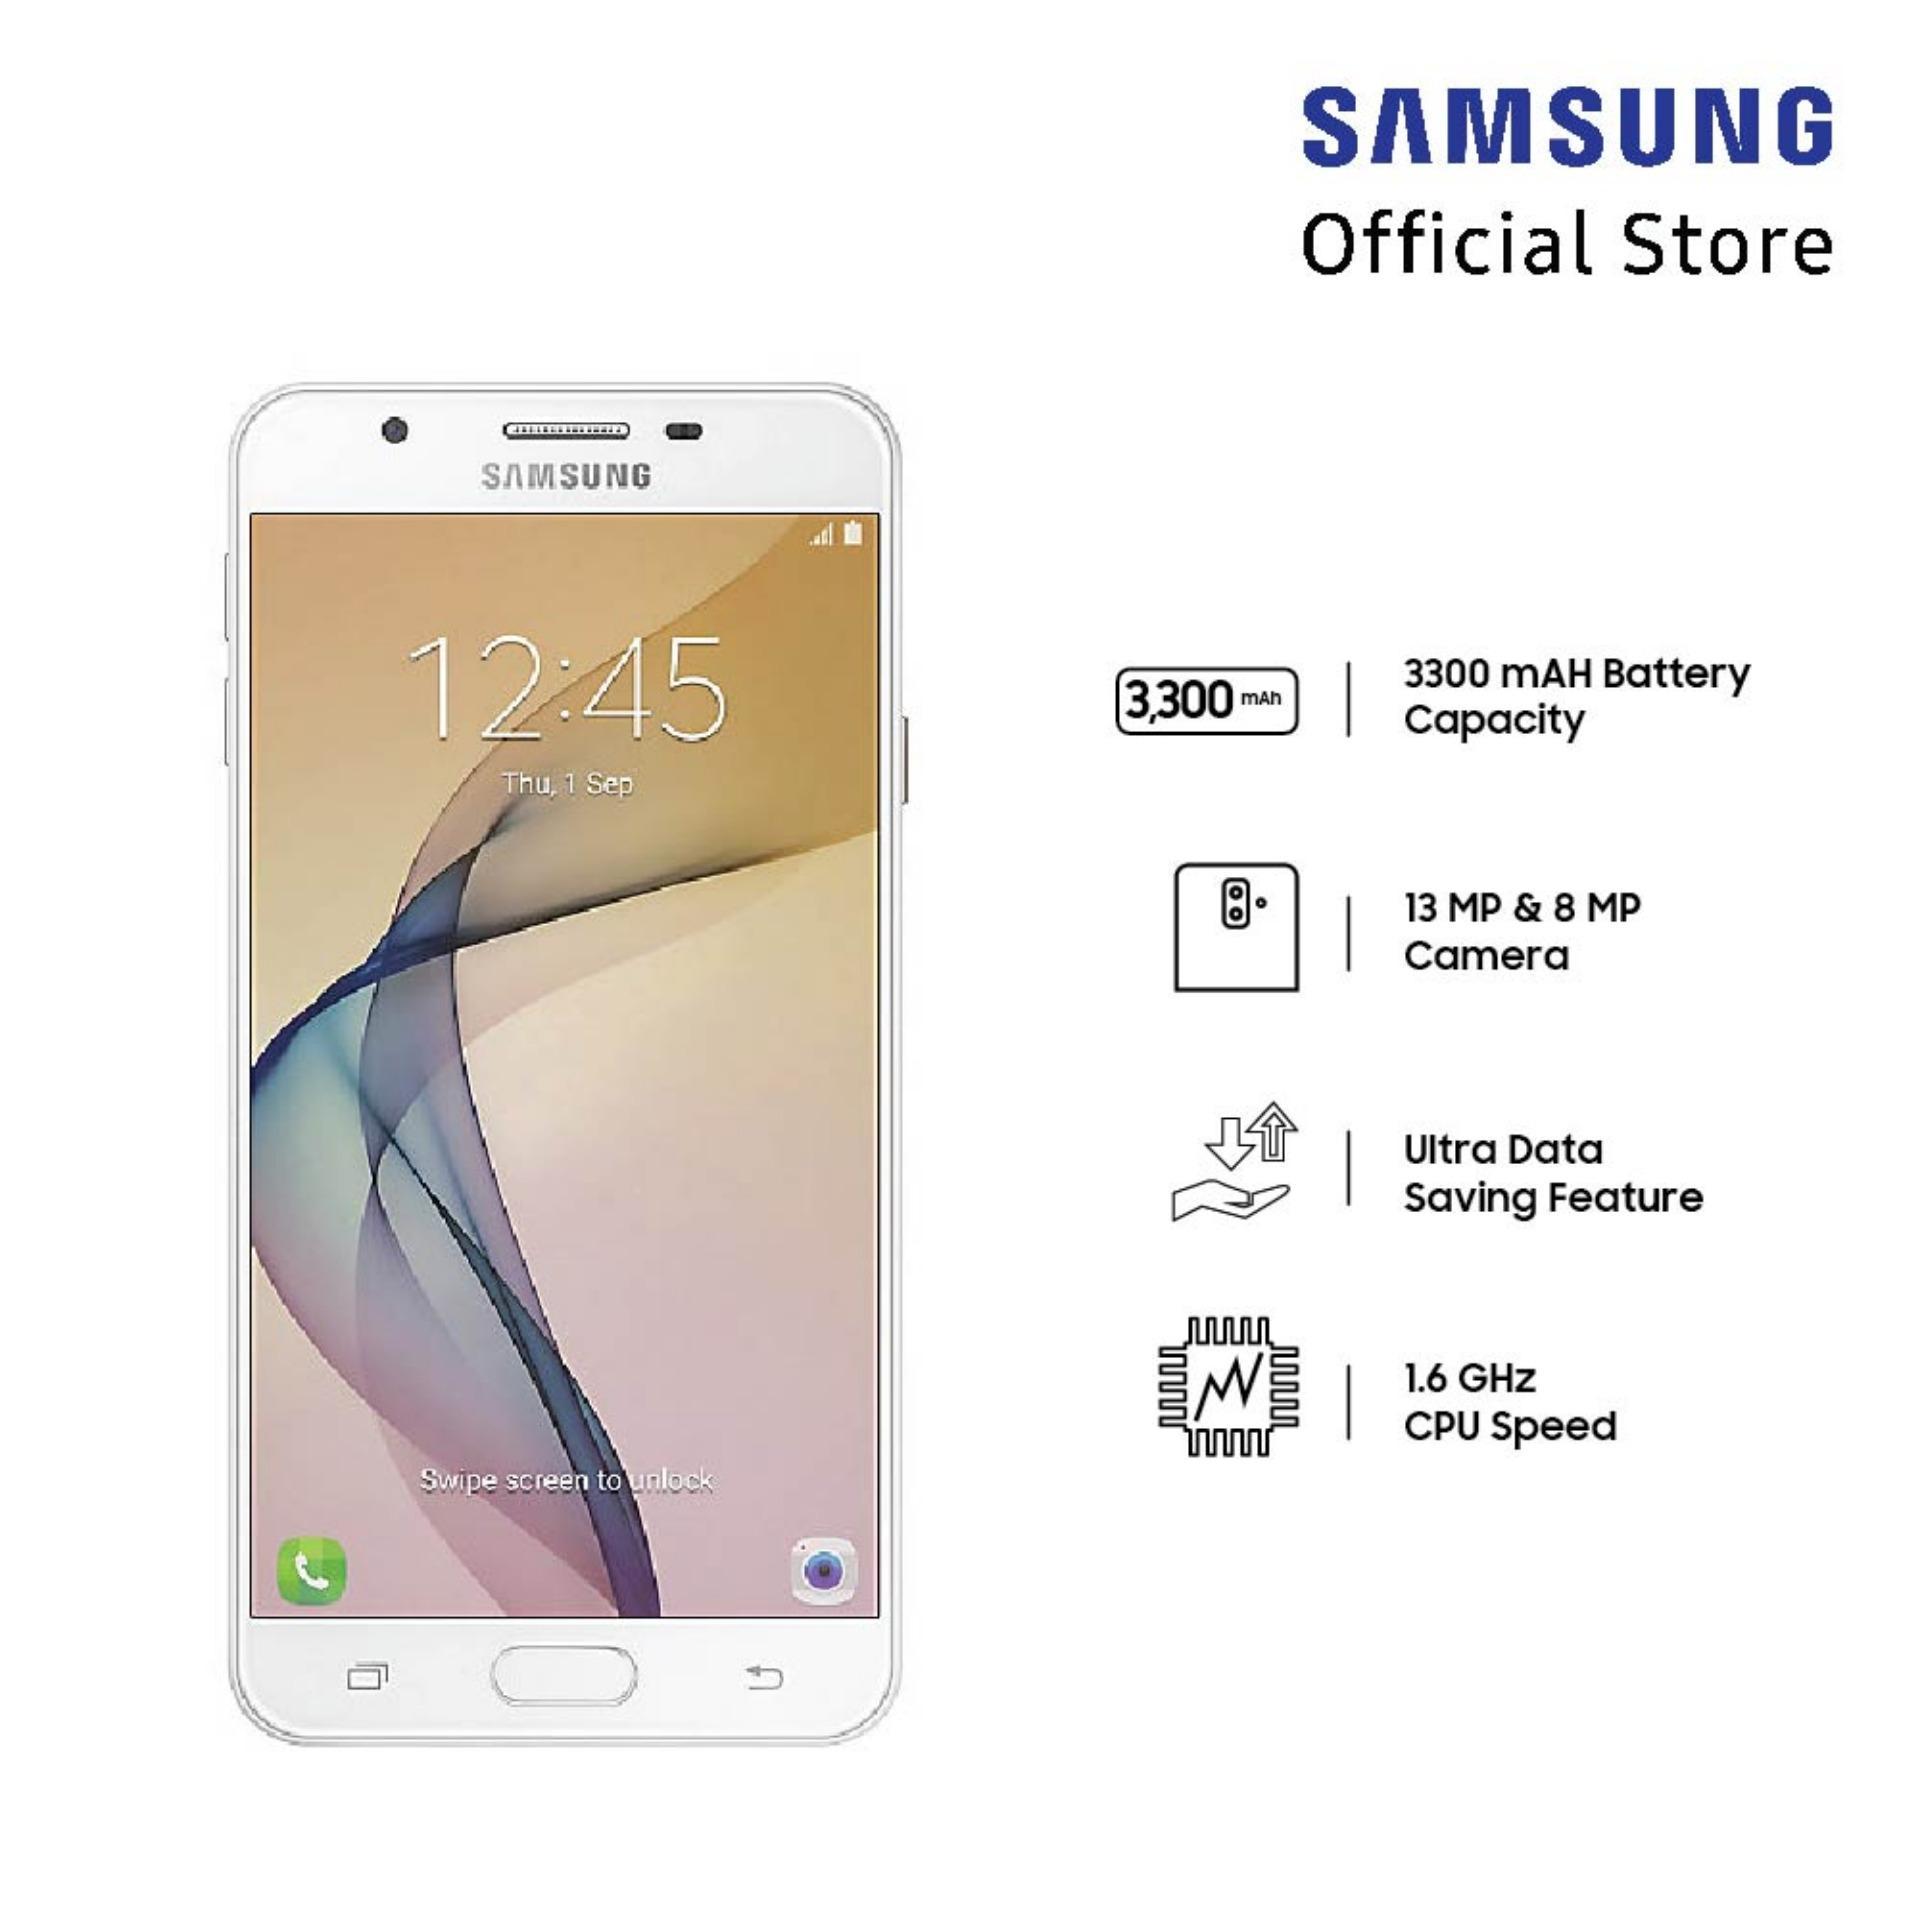 Jual Hp Samsung Terbaru Galaxy A3 2016 16gb Gold Garansi Resmi Indonesia Sein J7 Prime Sm G610 White